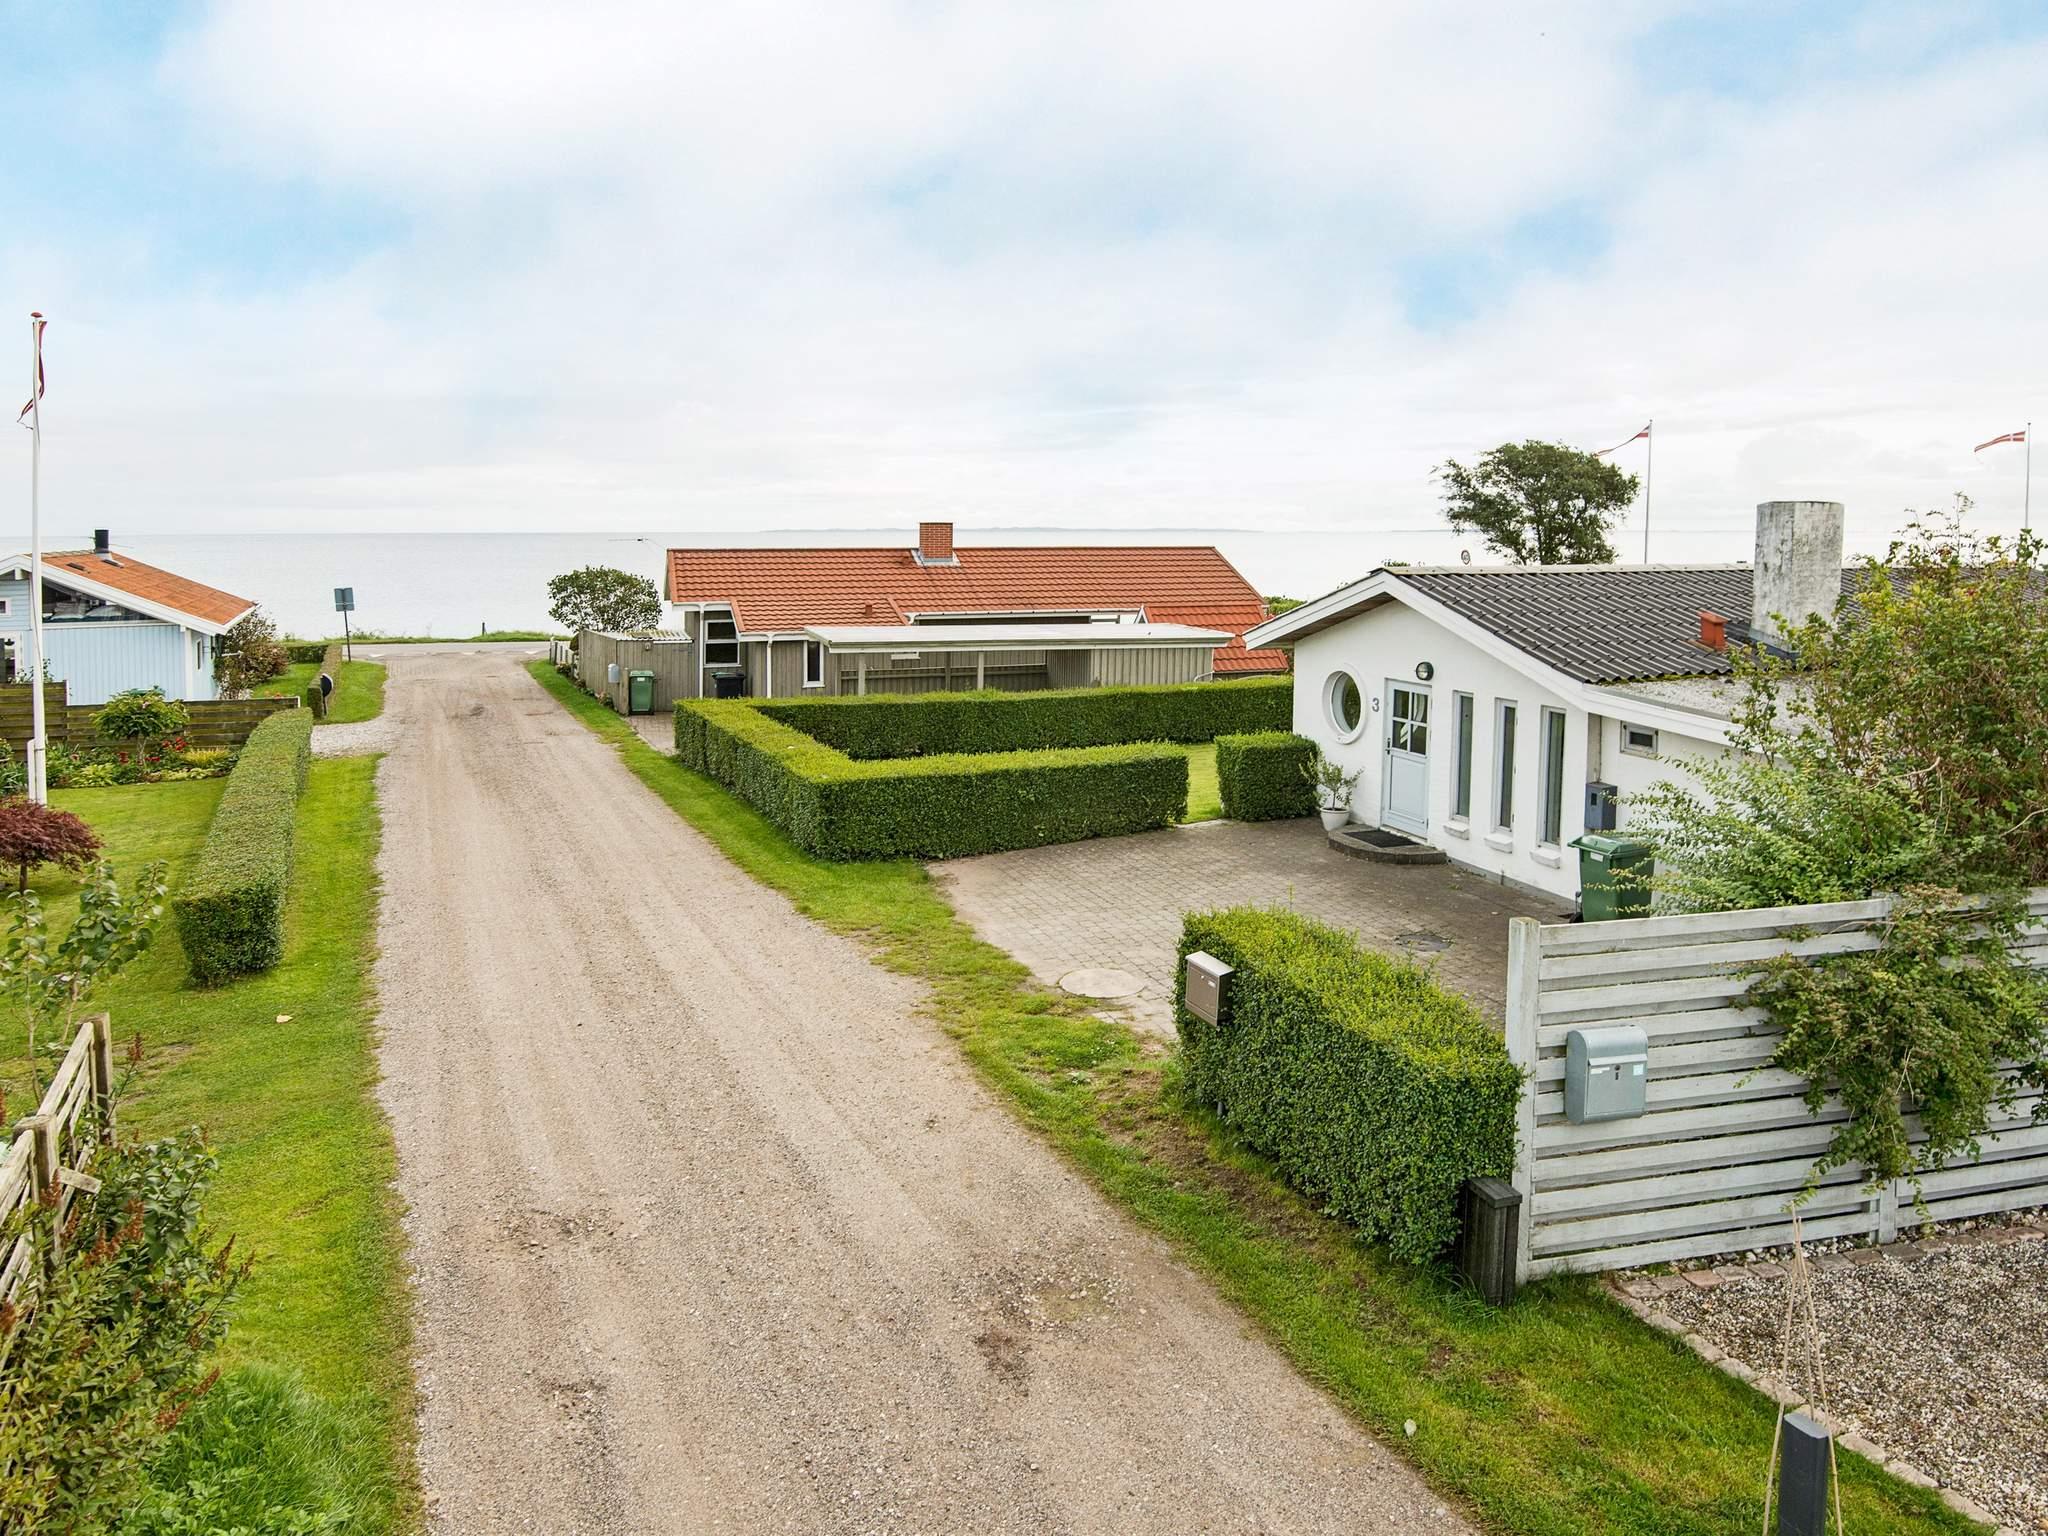 Ferienhaus Ajstrup Strand/Malling (2355032), Ajstrup, , Ostjütland, Dänemark, Bild 16